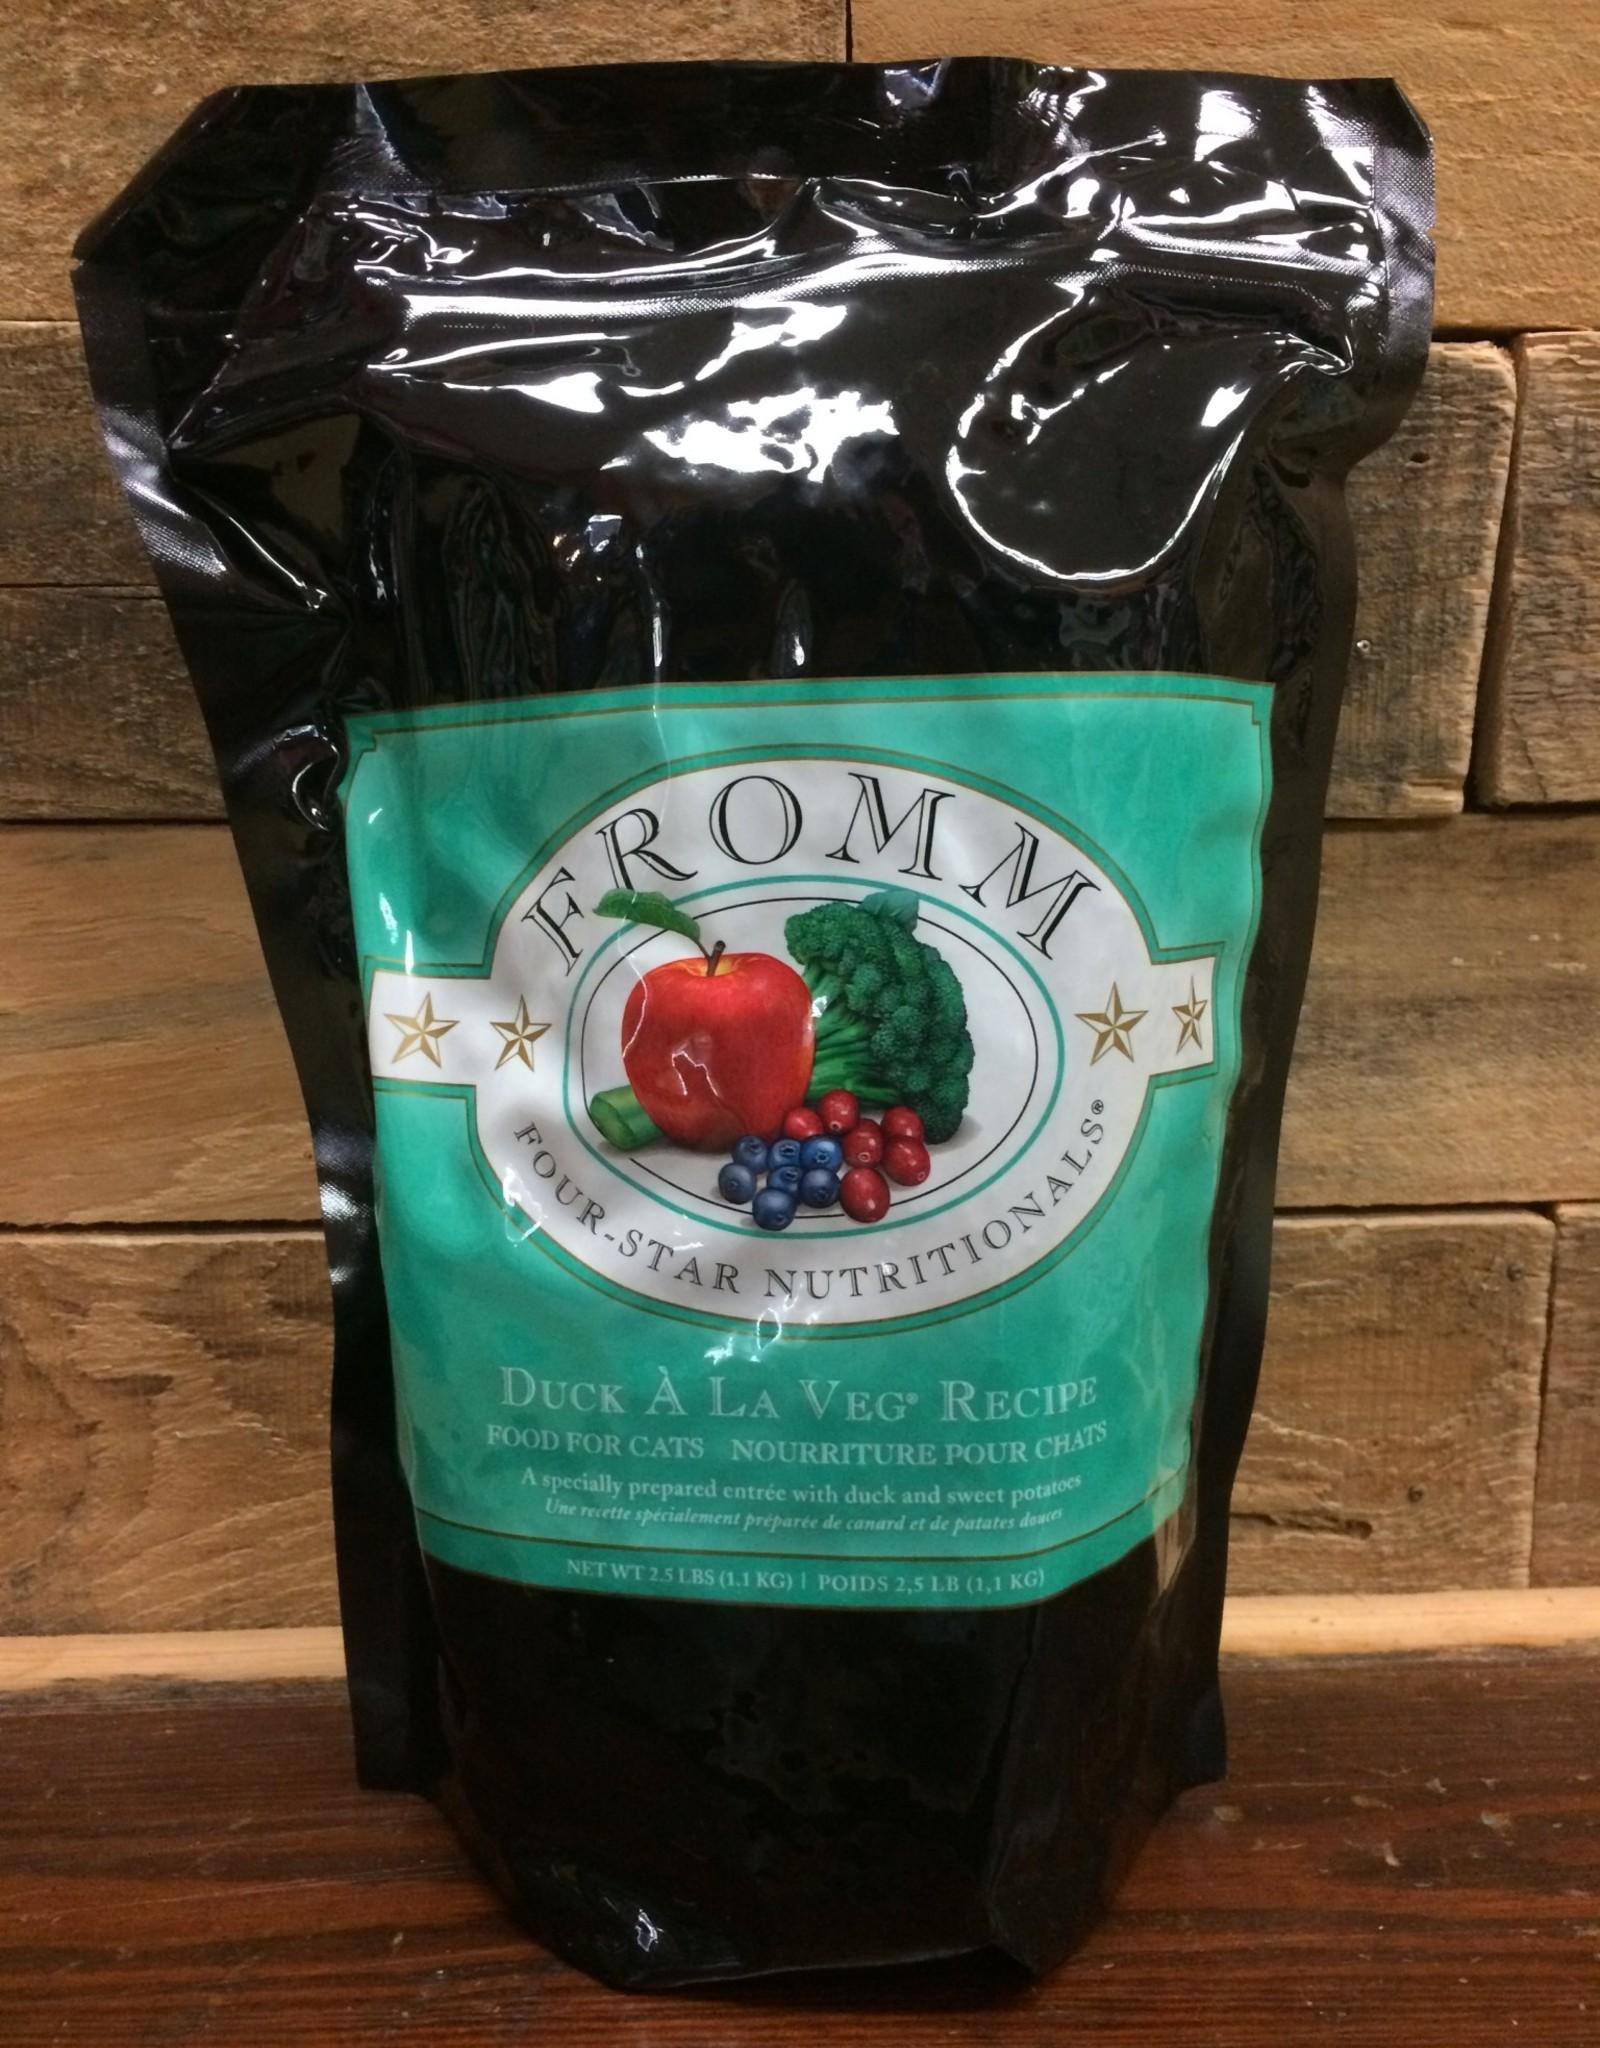 Fromm Family Foods Fromm 4star Duck A La Veg cat 2.5#